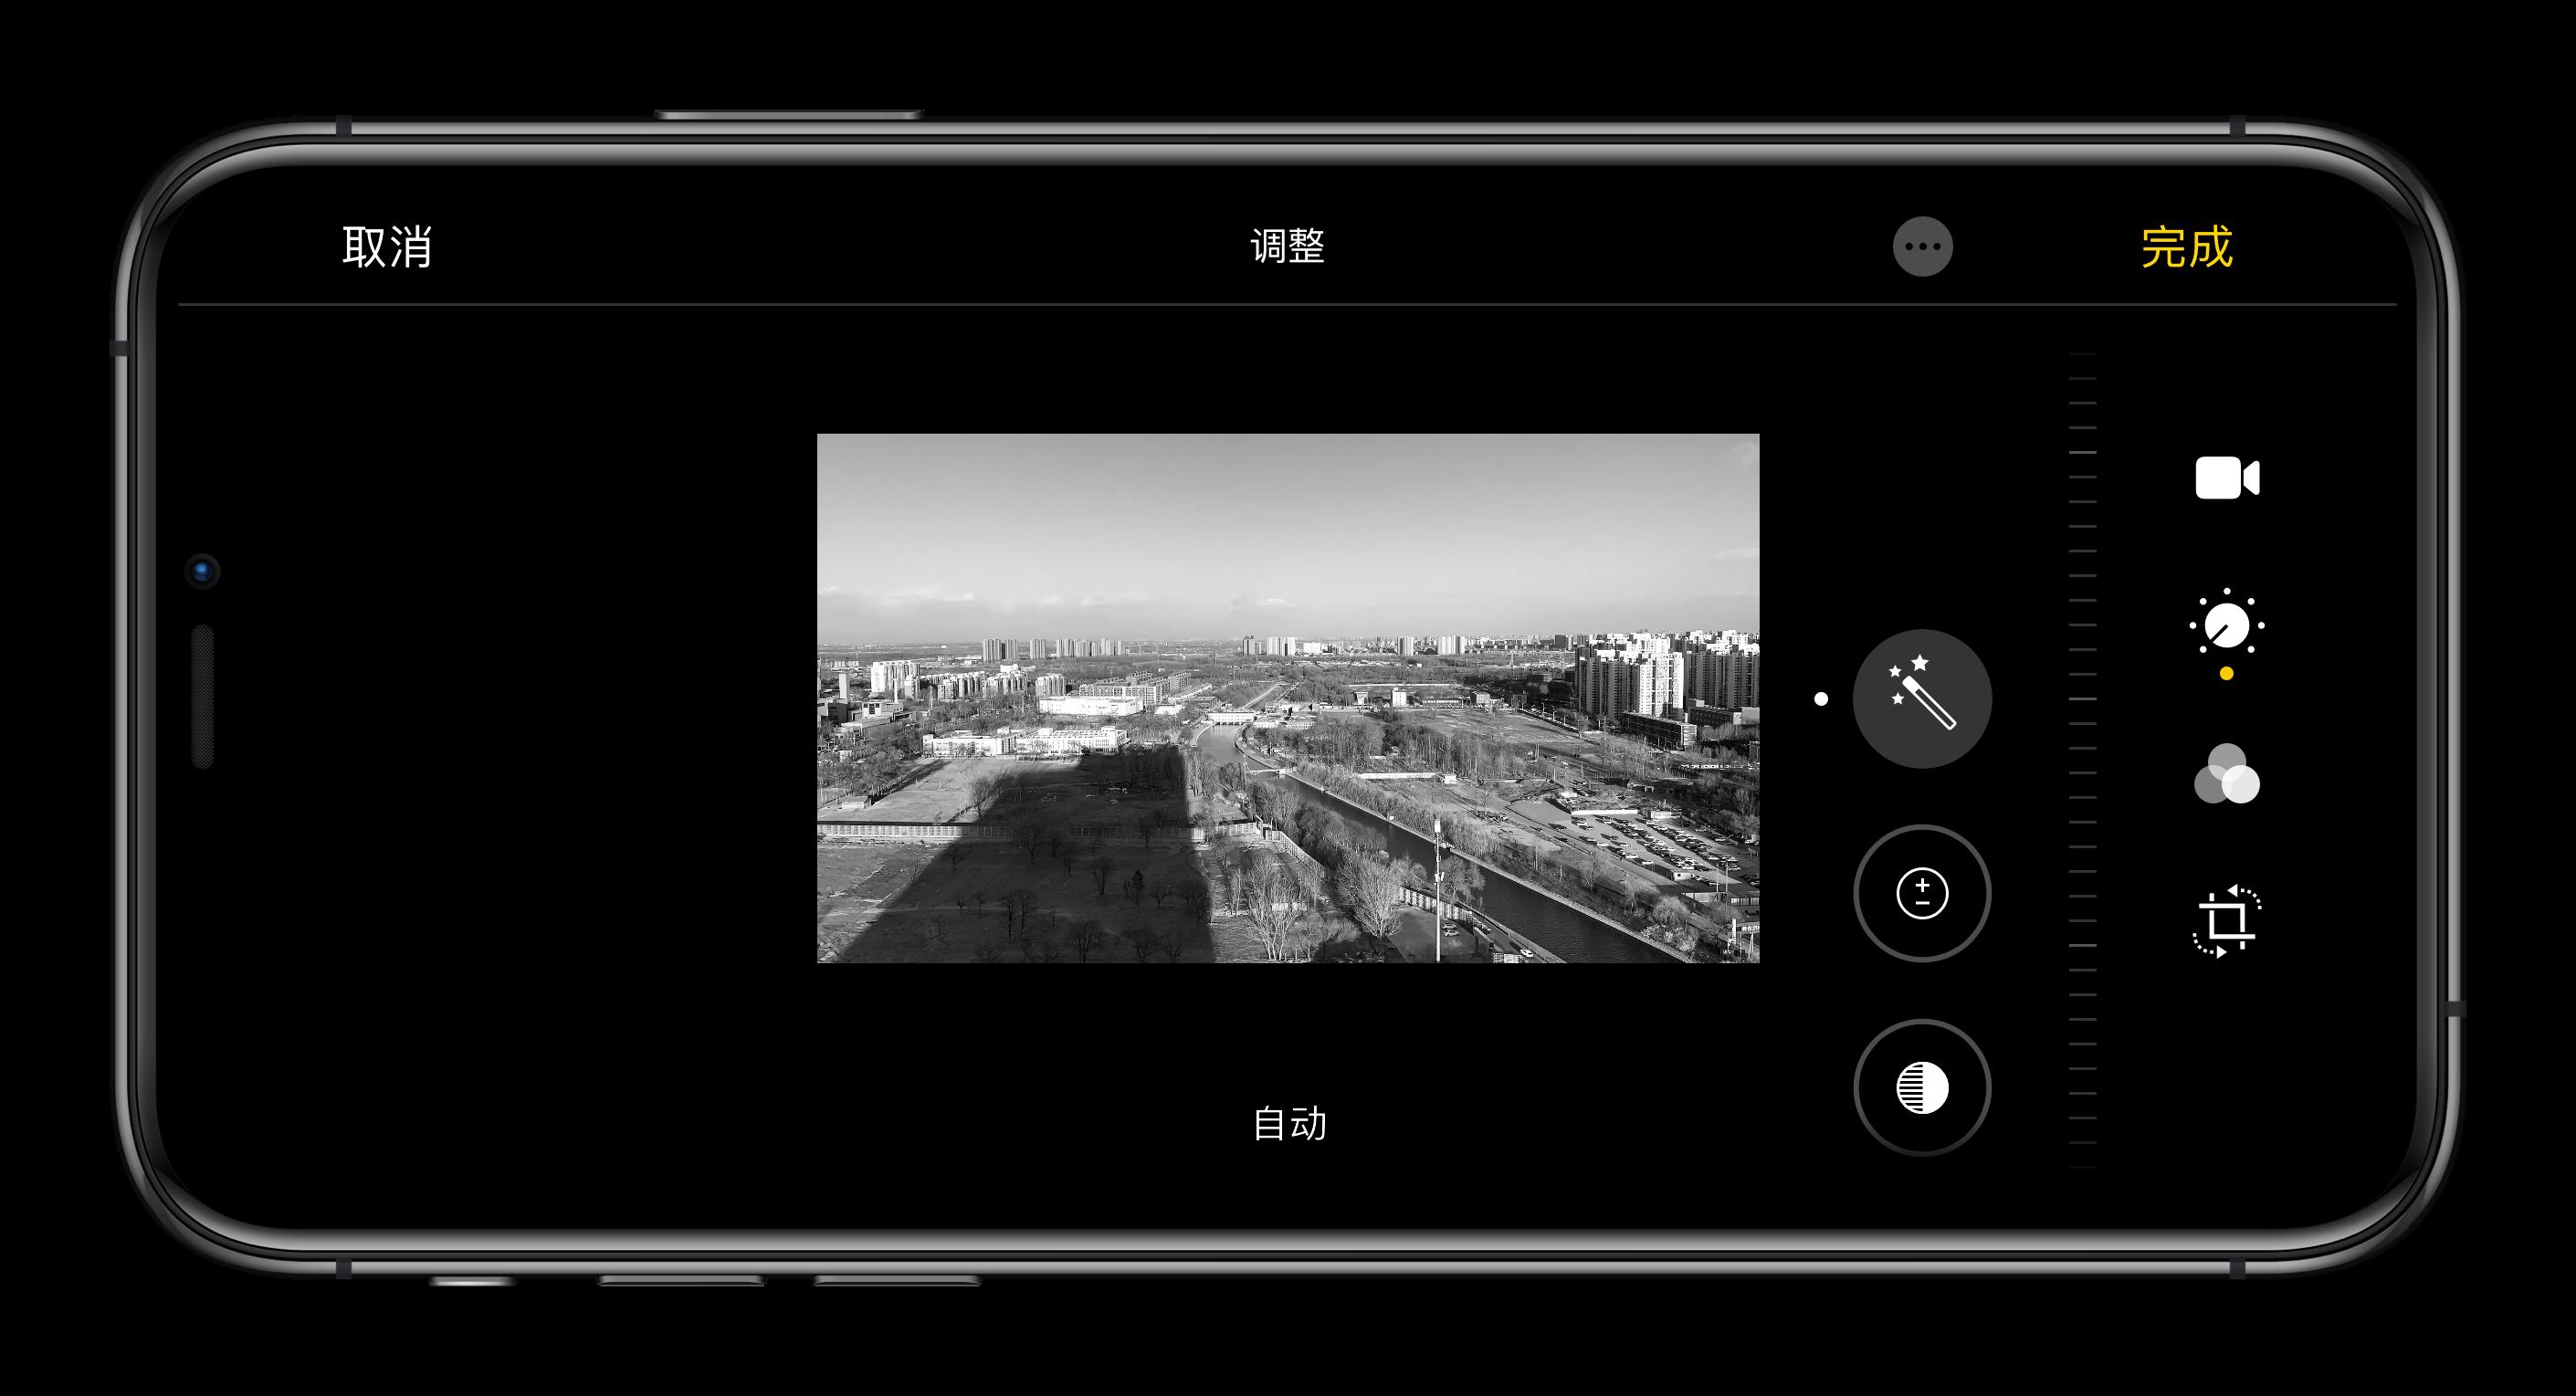 iOS 13 拍摄技巧:更强大的照片编辑工具